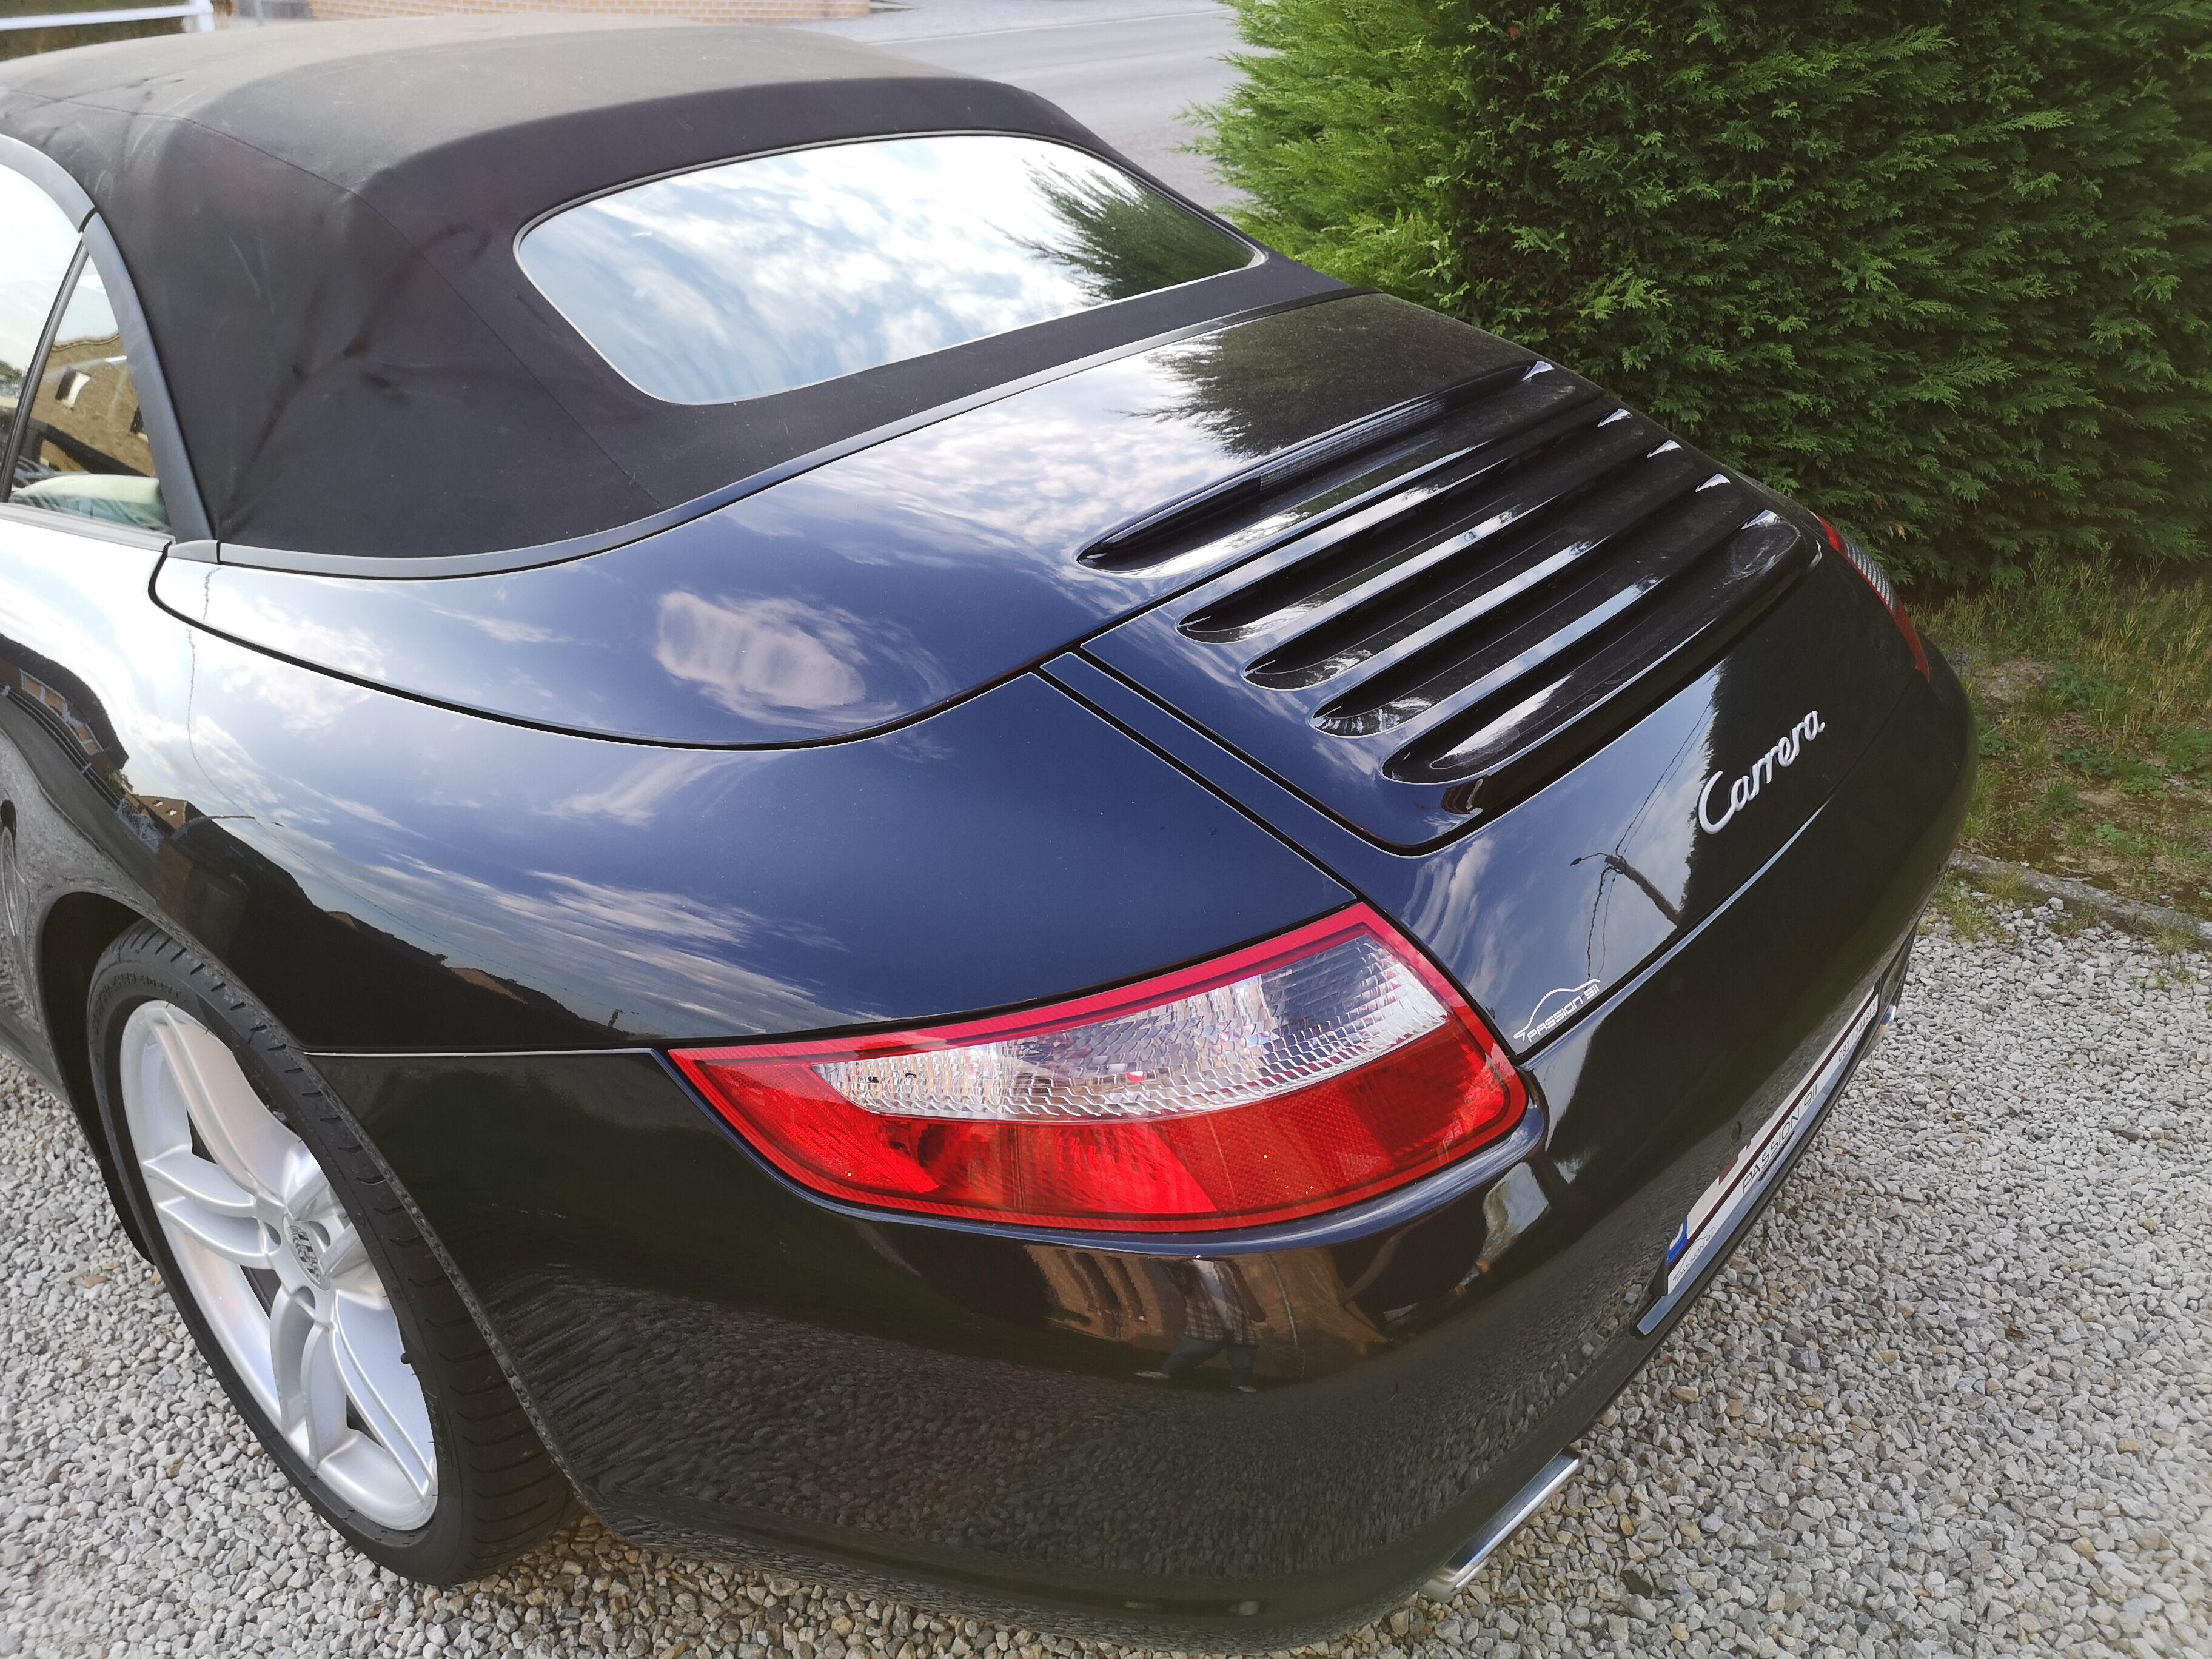 Porsche 911 CARRERA 2 CABRIOLET - 2008 9/15